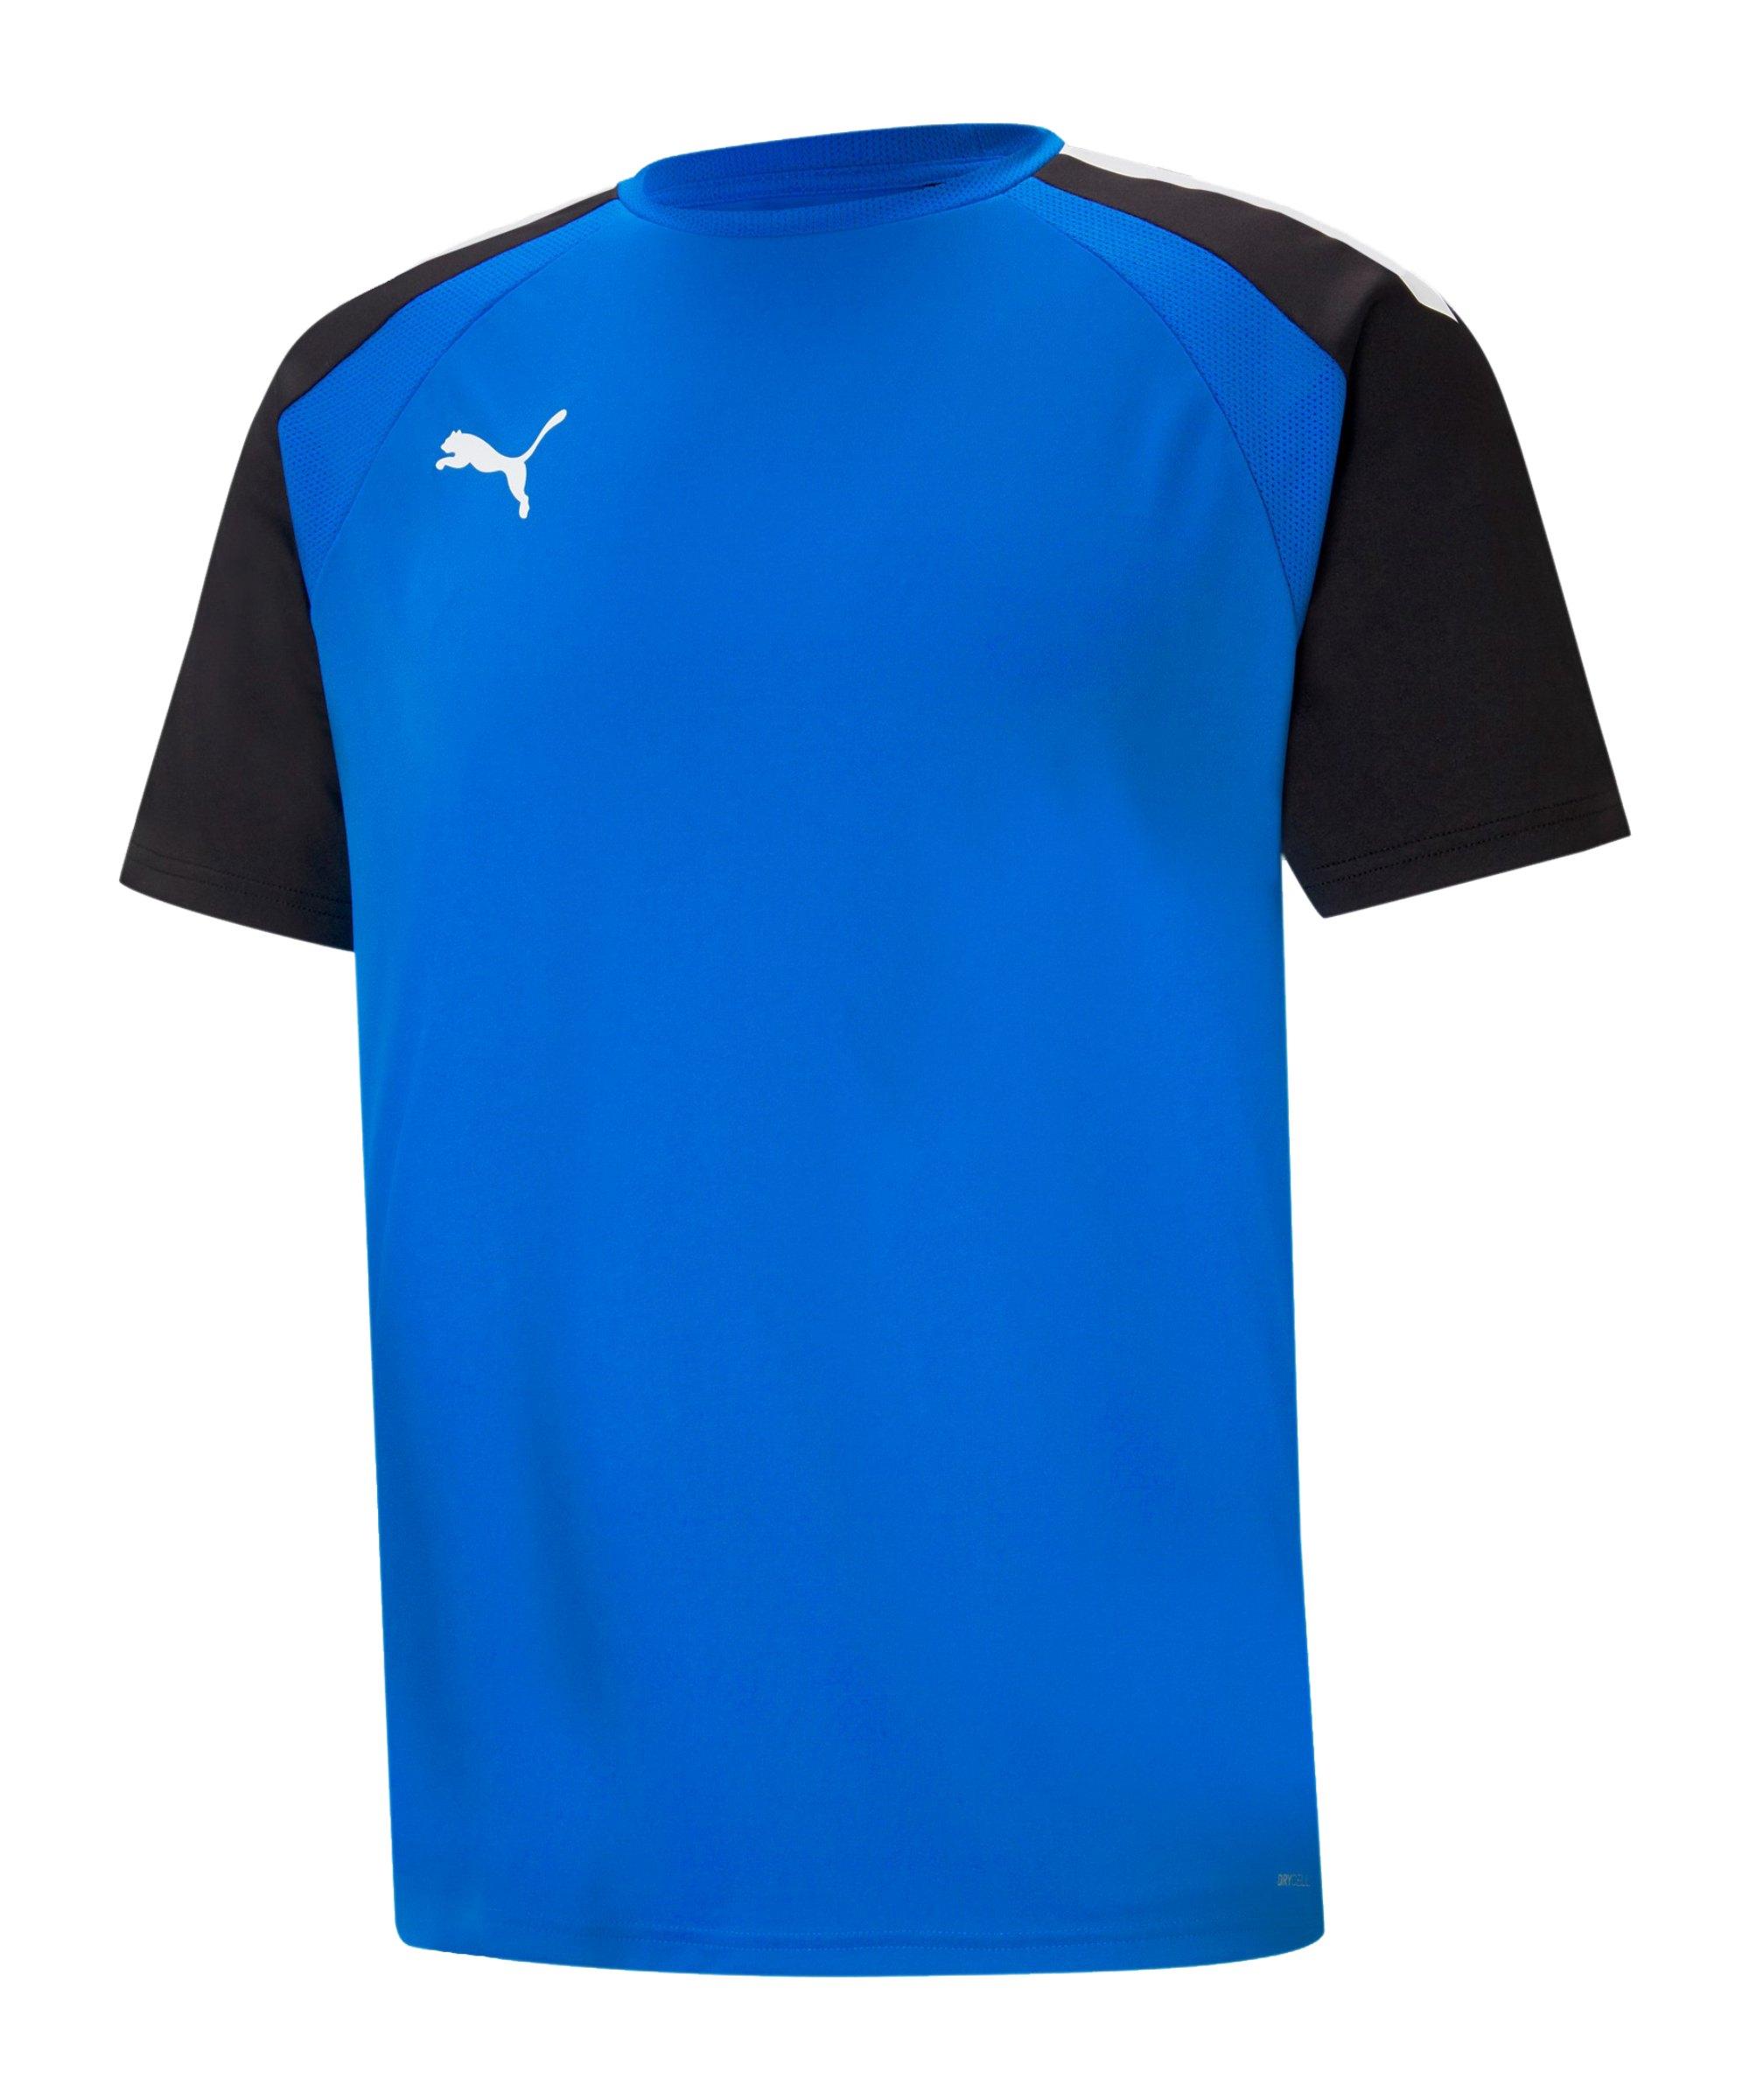 PUMA teamPacer Trikot Blau F02 - blau